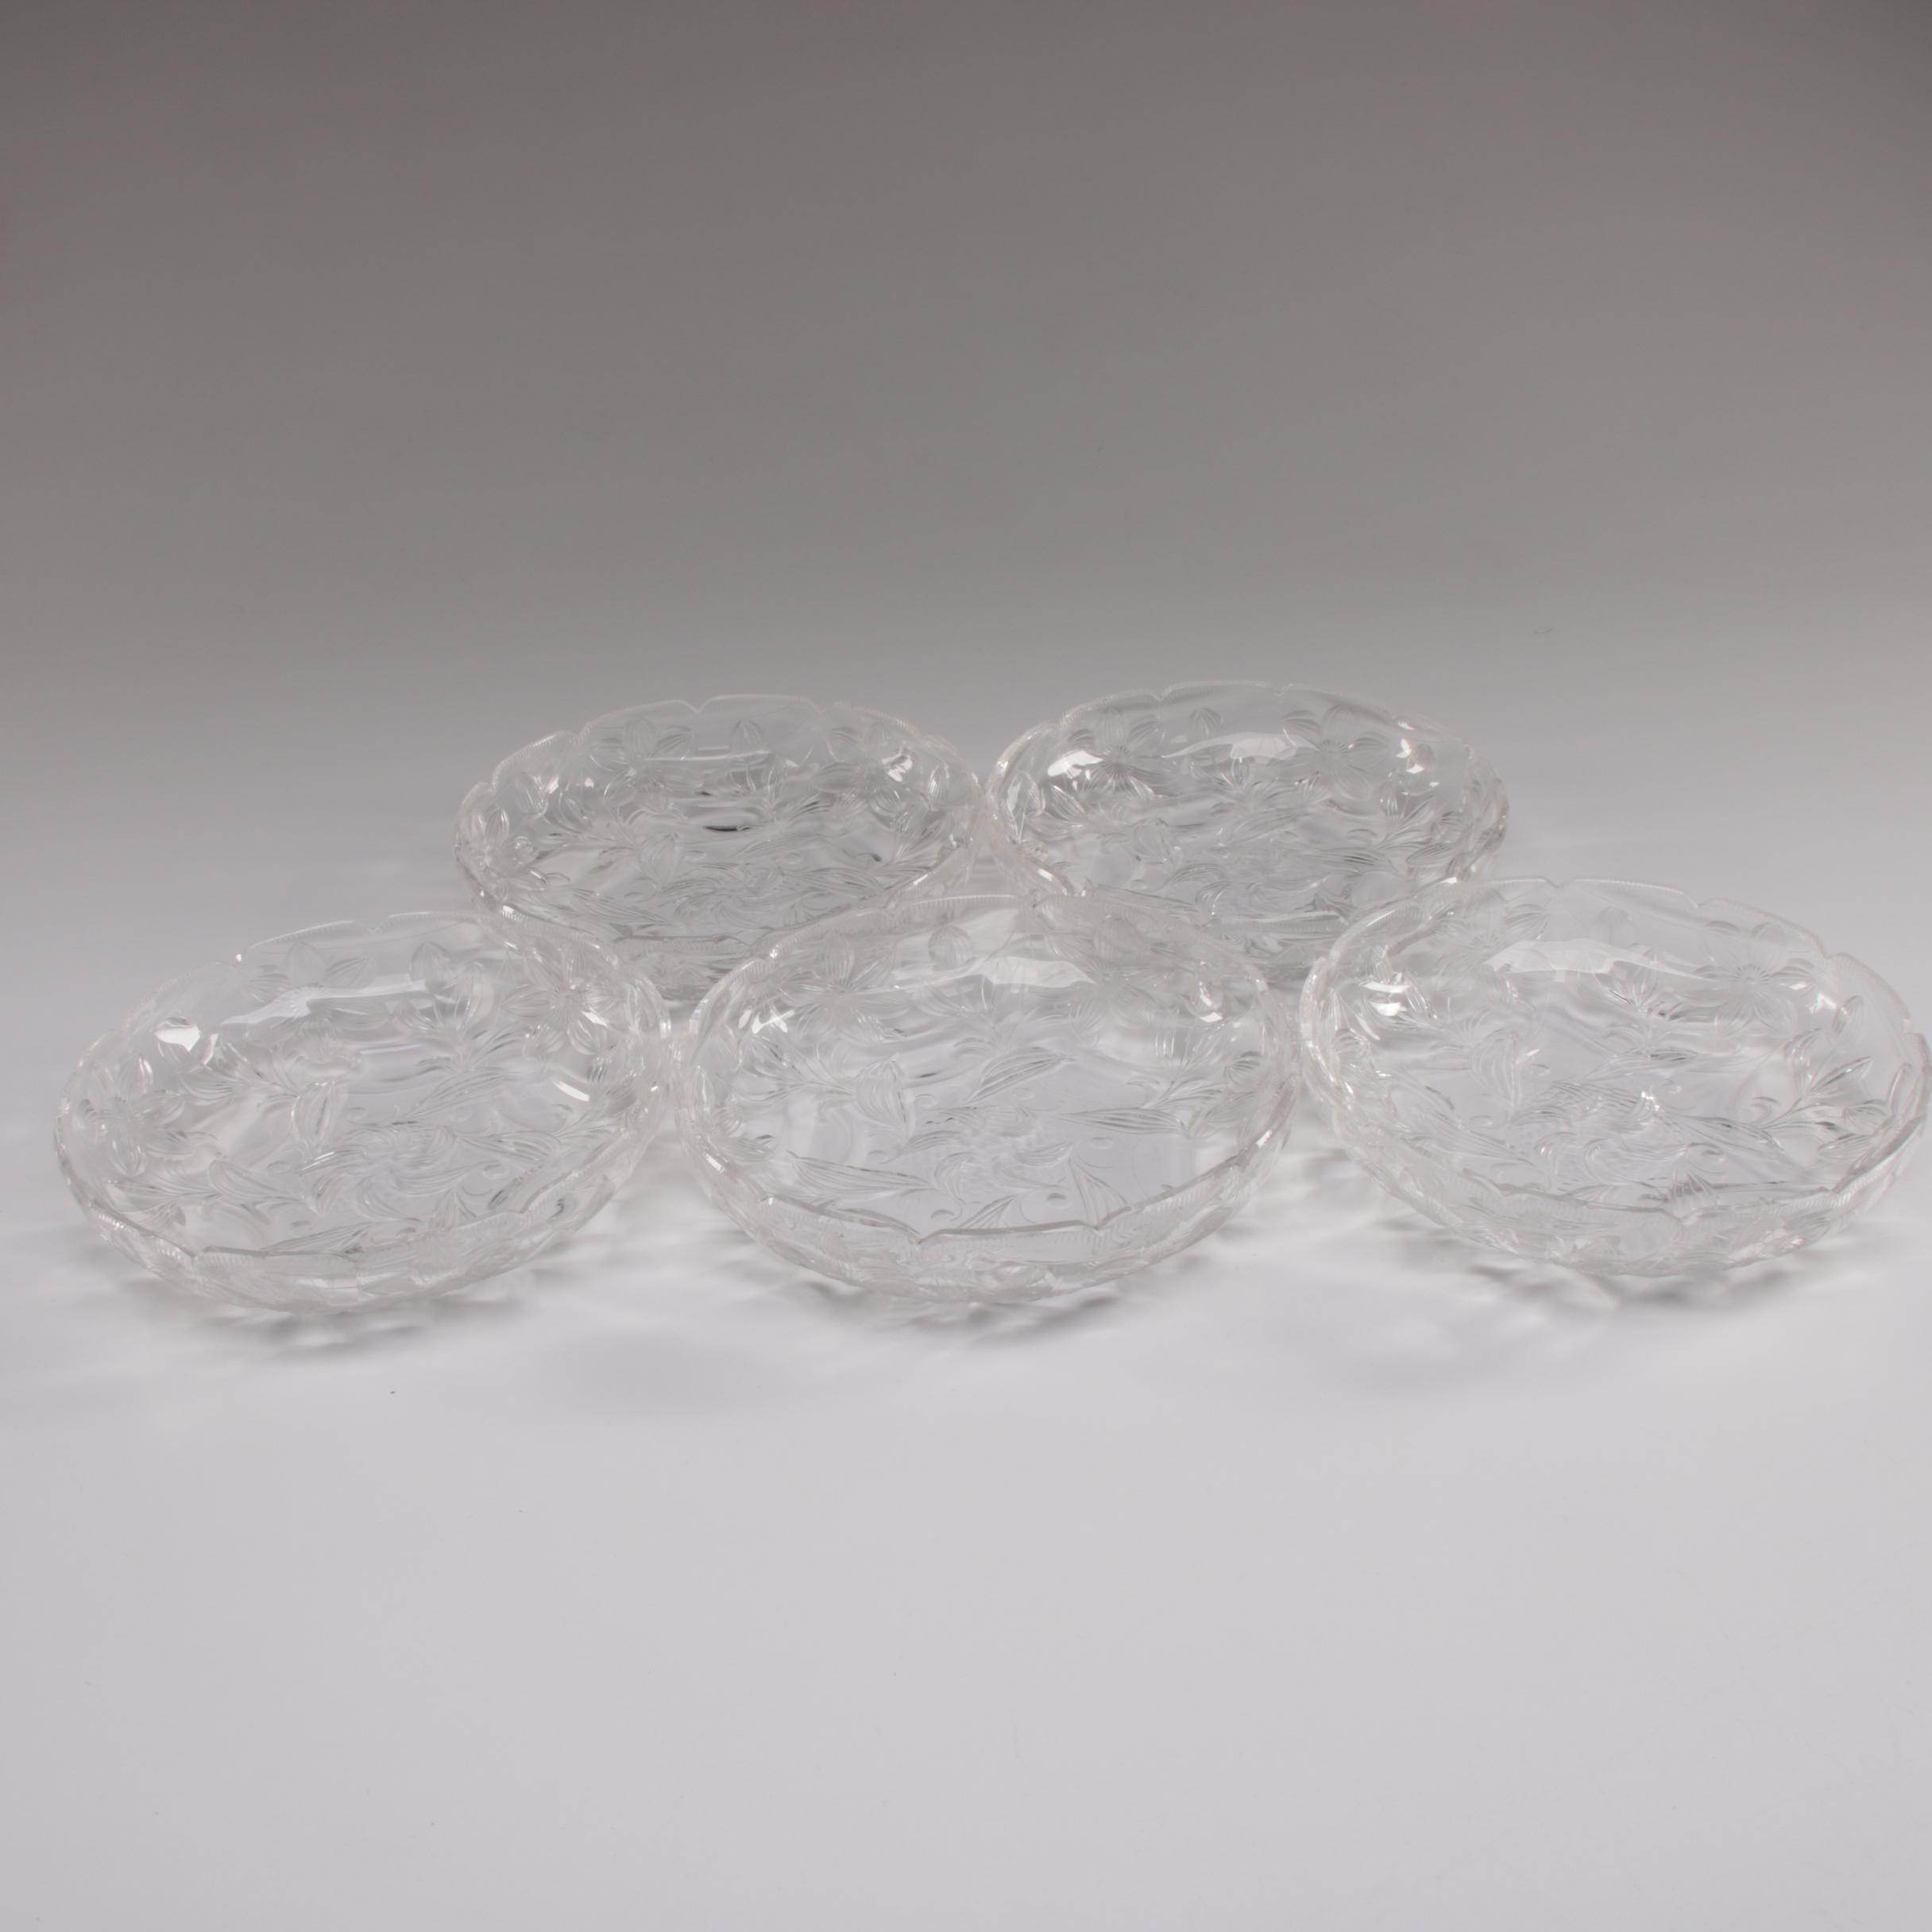 American Cut Glass Salad Bowls, Early 20th Century